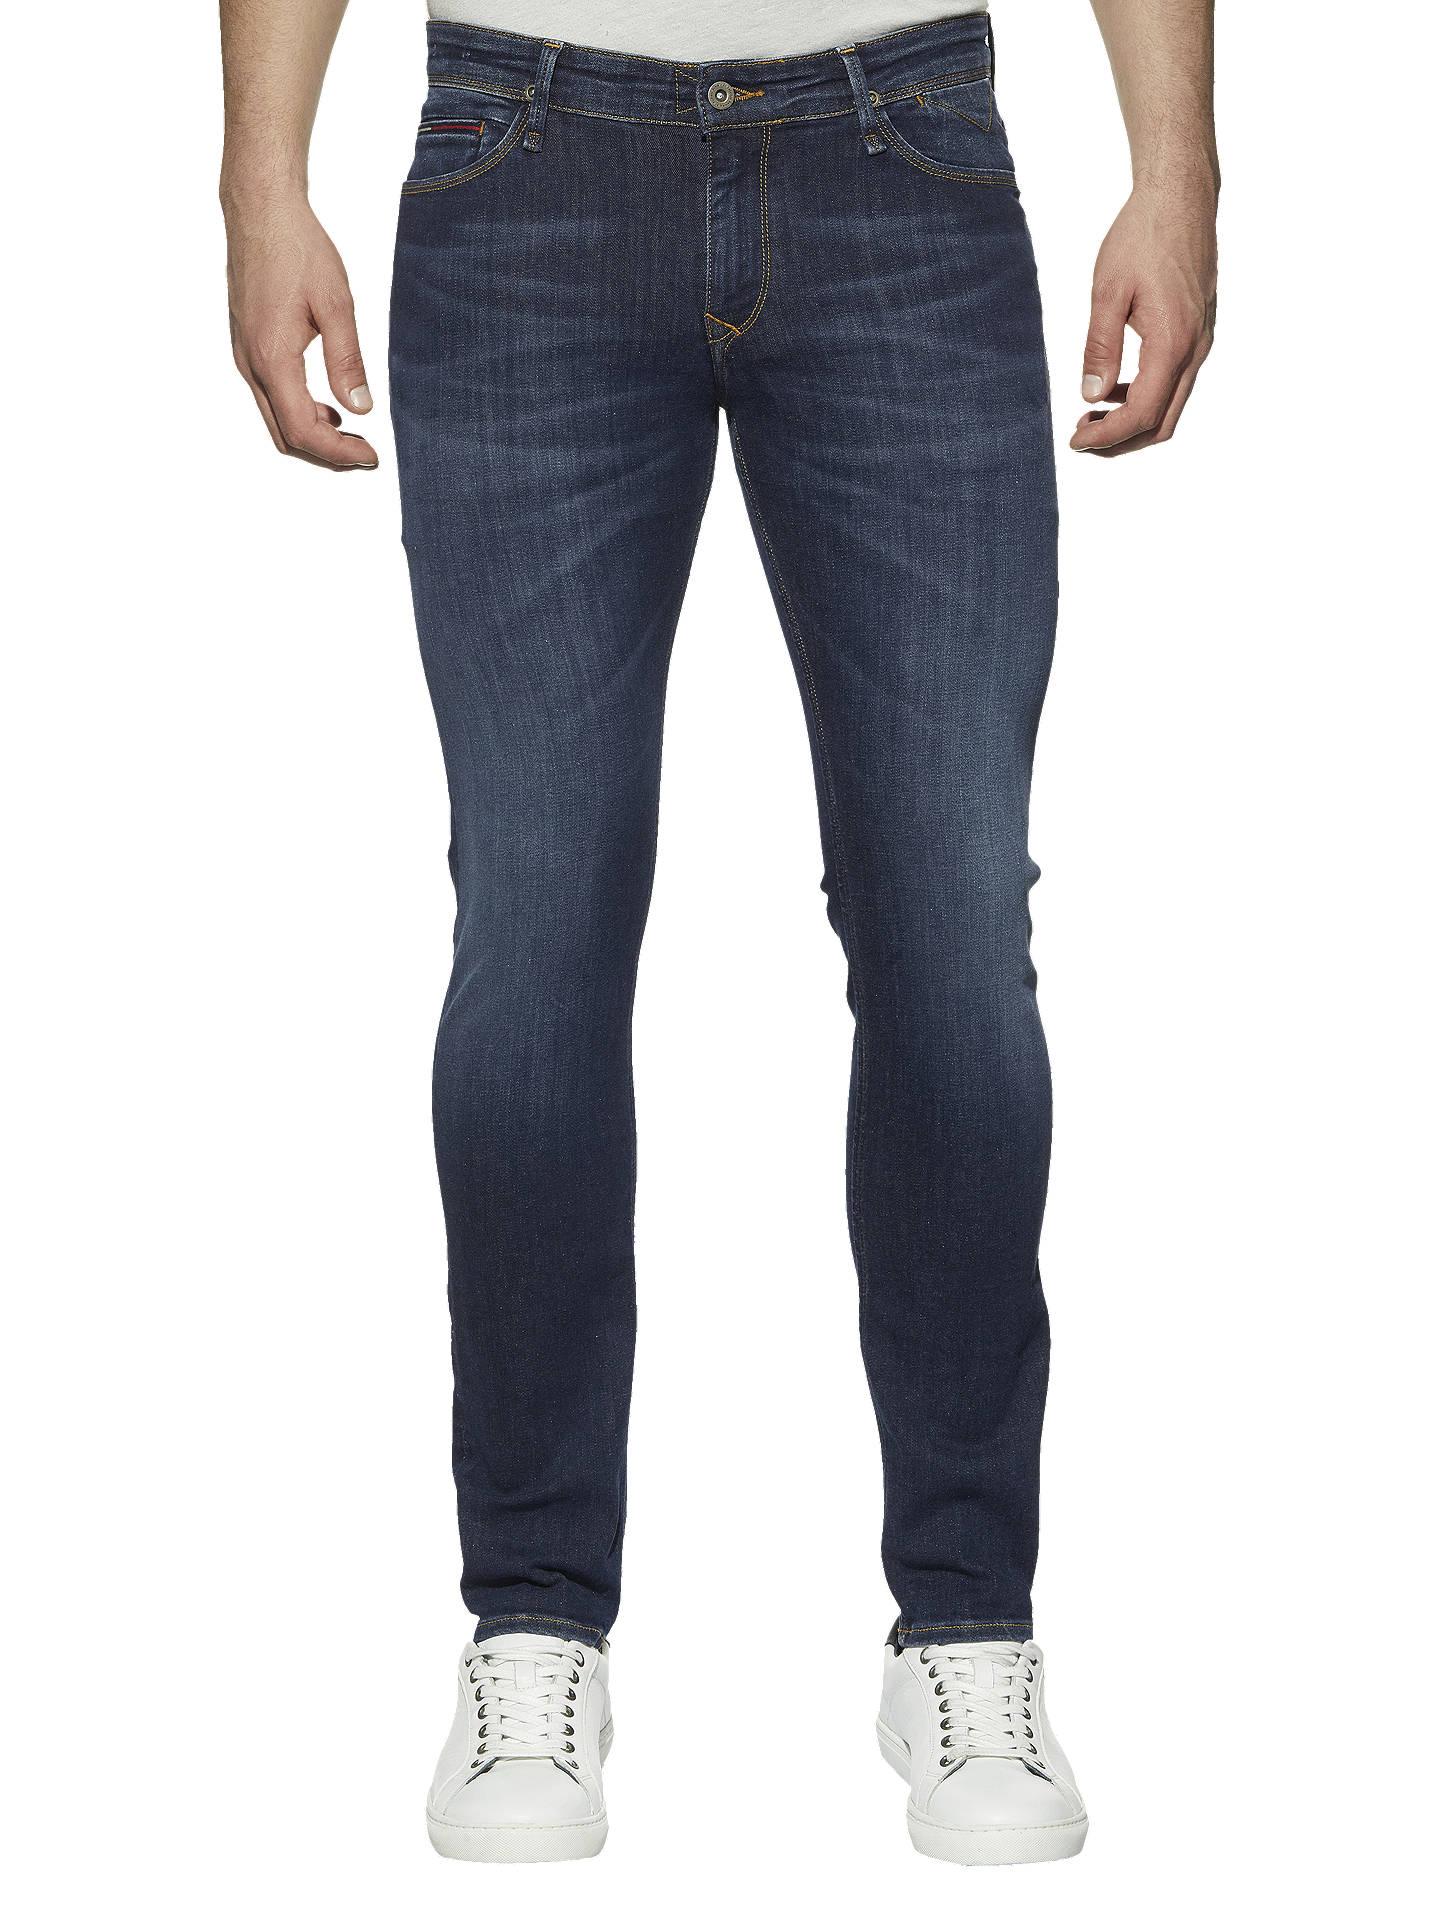 f3cde48c Buy Tommy Jeans Skinny Simon Jeans, Dark Blue, 34R Online at johnlewis.com  ...